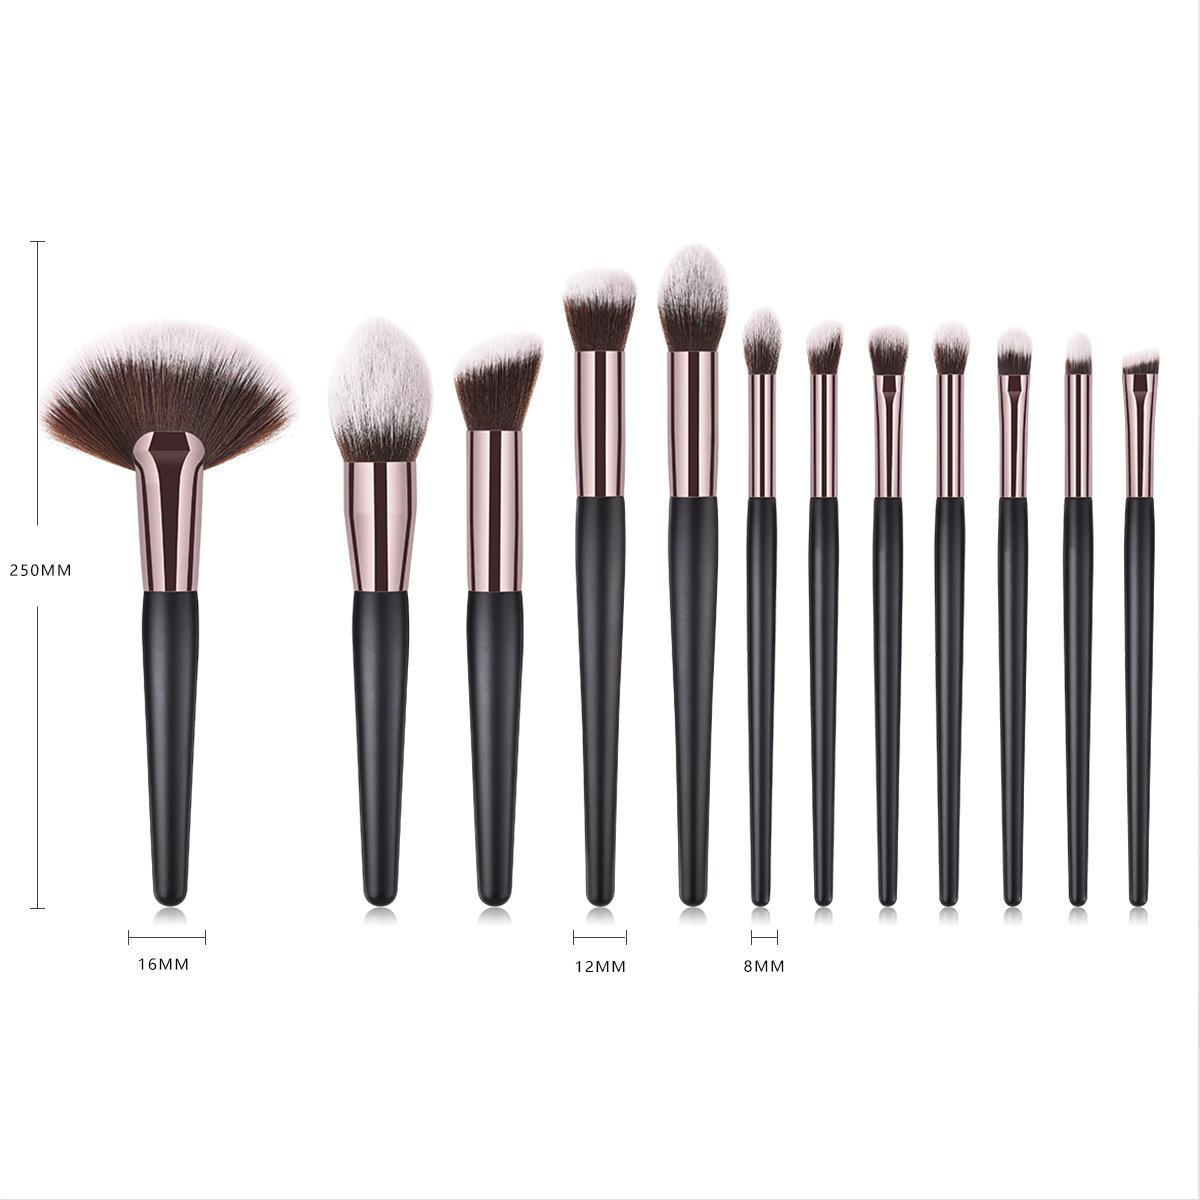 Professional Black Makeup brush set 40pcs big face brush Powder Foundation Contour eye brush